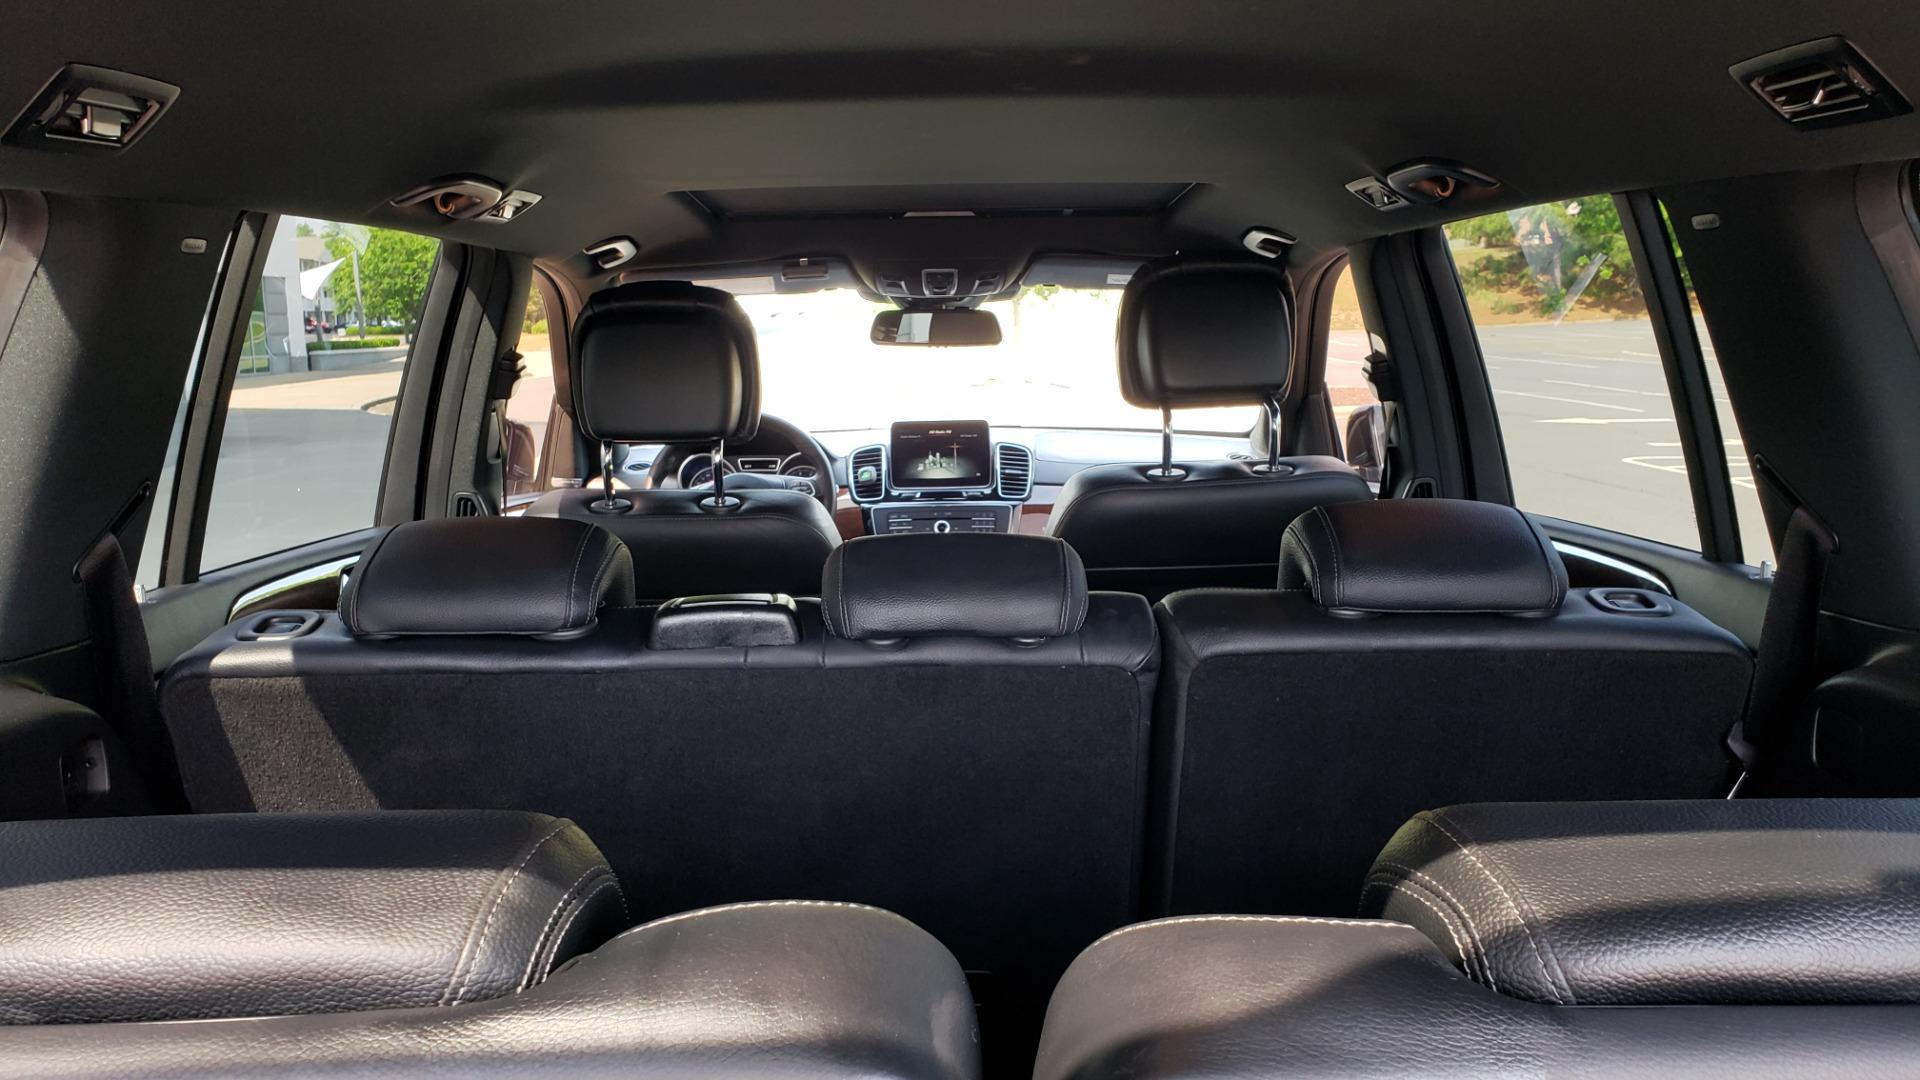 Used 2017 Mercedes-Benz GLS GLS 550 for sale Sold at Formula Imports in Charlotte NC 28227 16